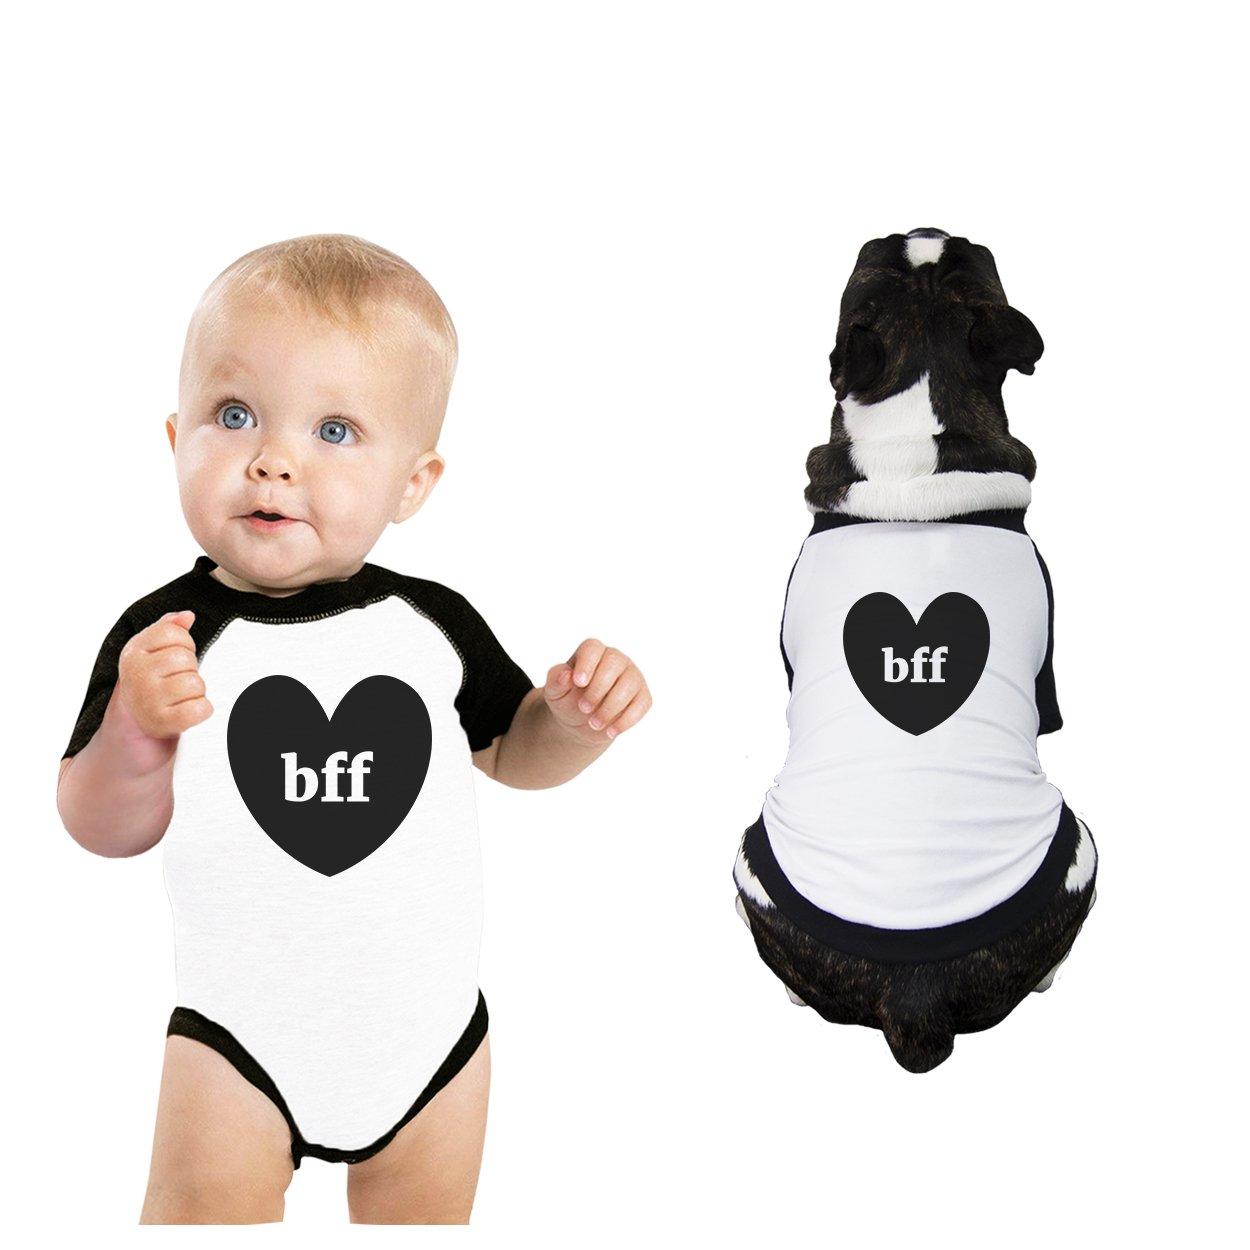 365 Printing BFF Hearts Baby Pet Matching Raglan Shirts Cute